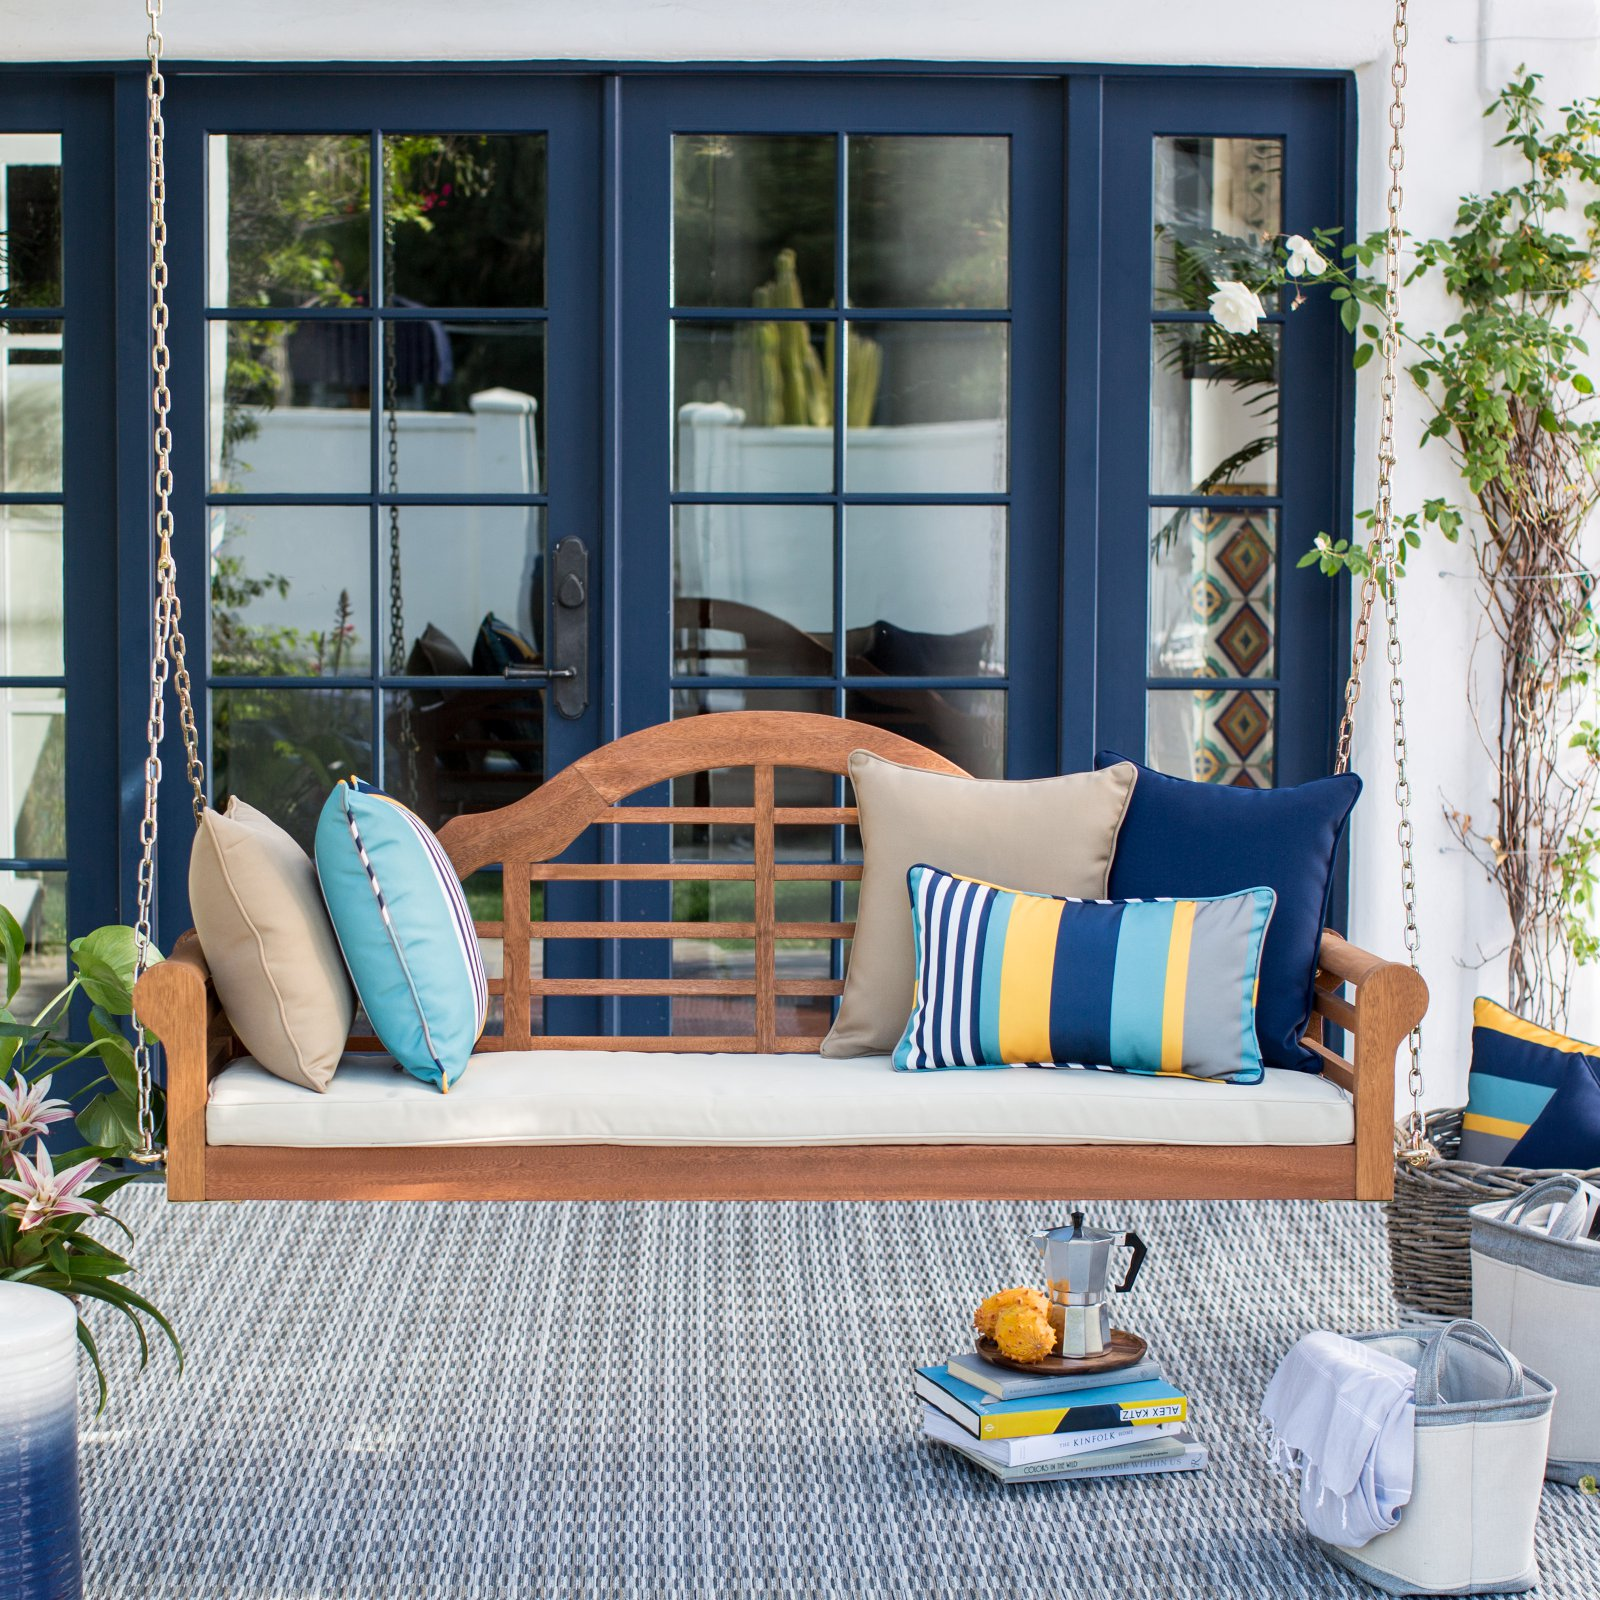 Belham Living Kimbro Lutyens Outdoor Porch Swing with Cushion